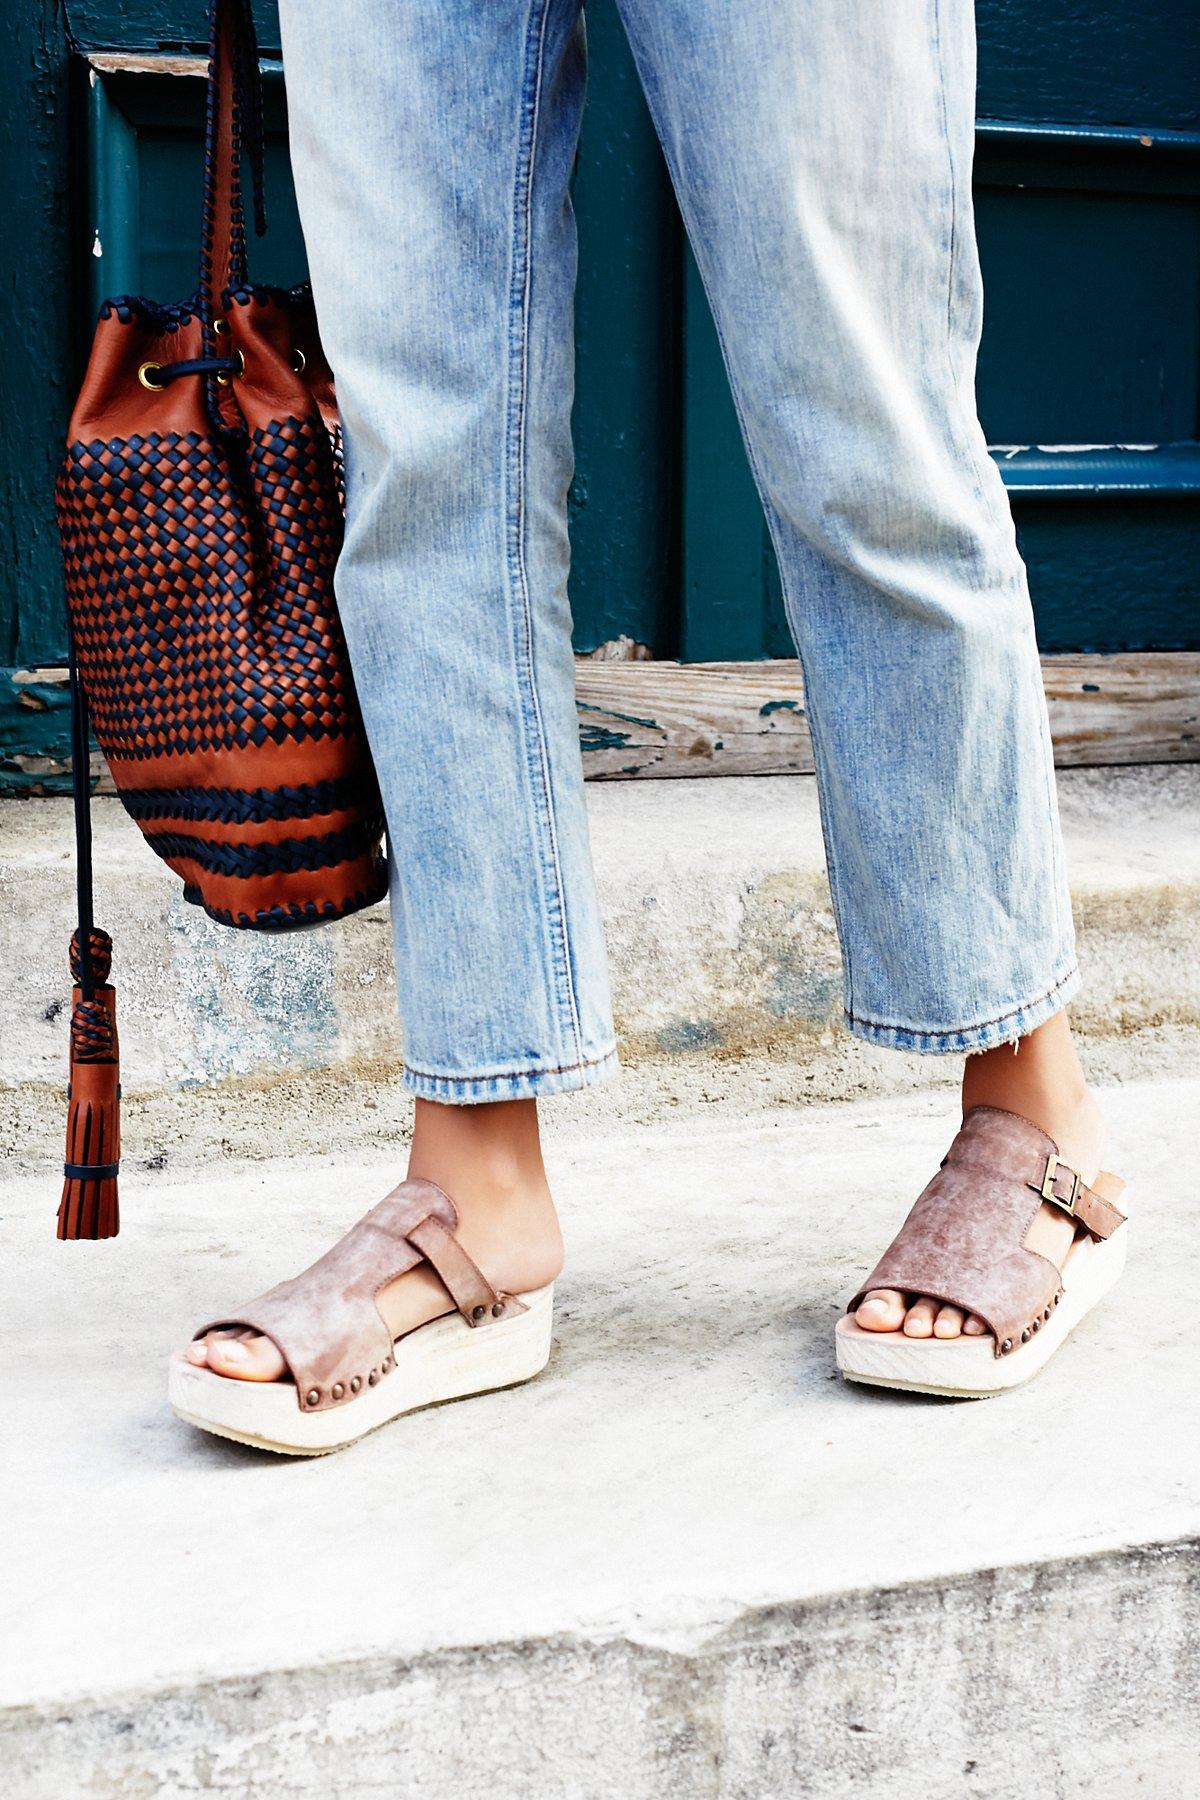 Oasis Wood懒人凉鞋